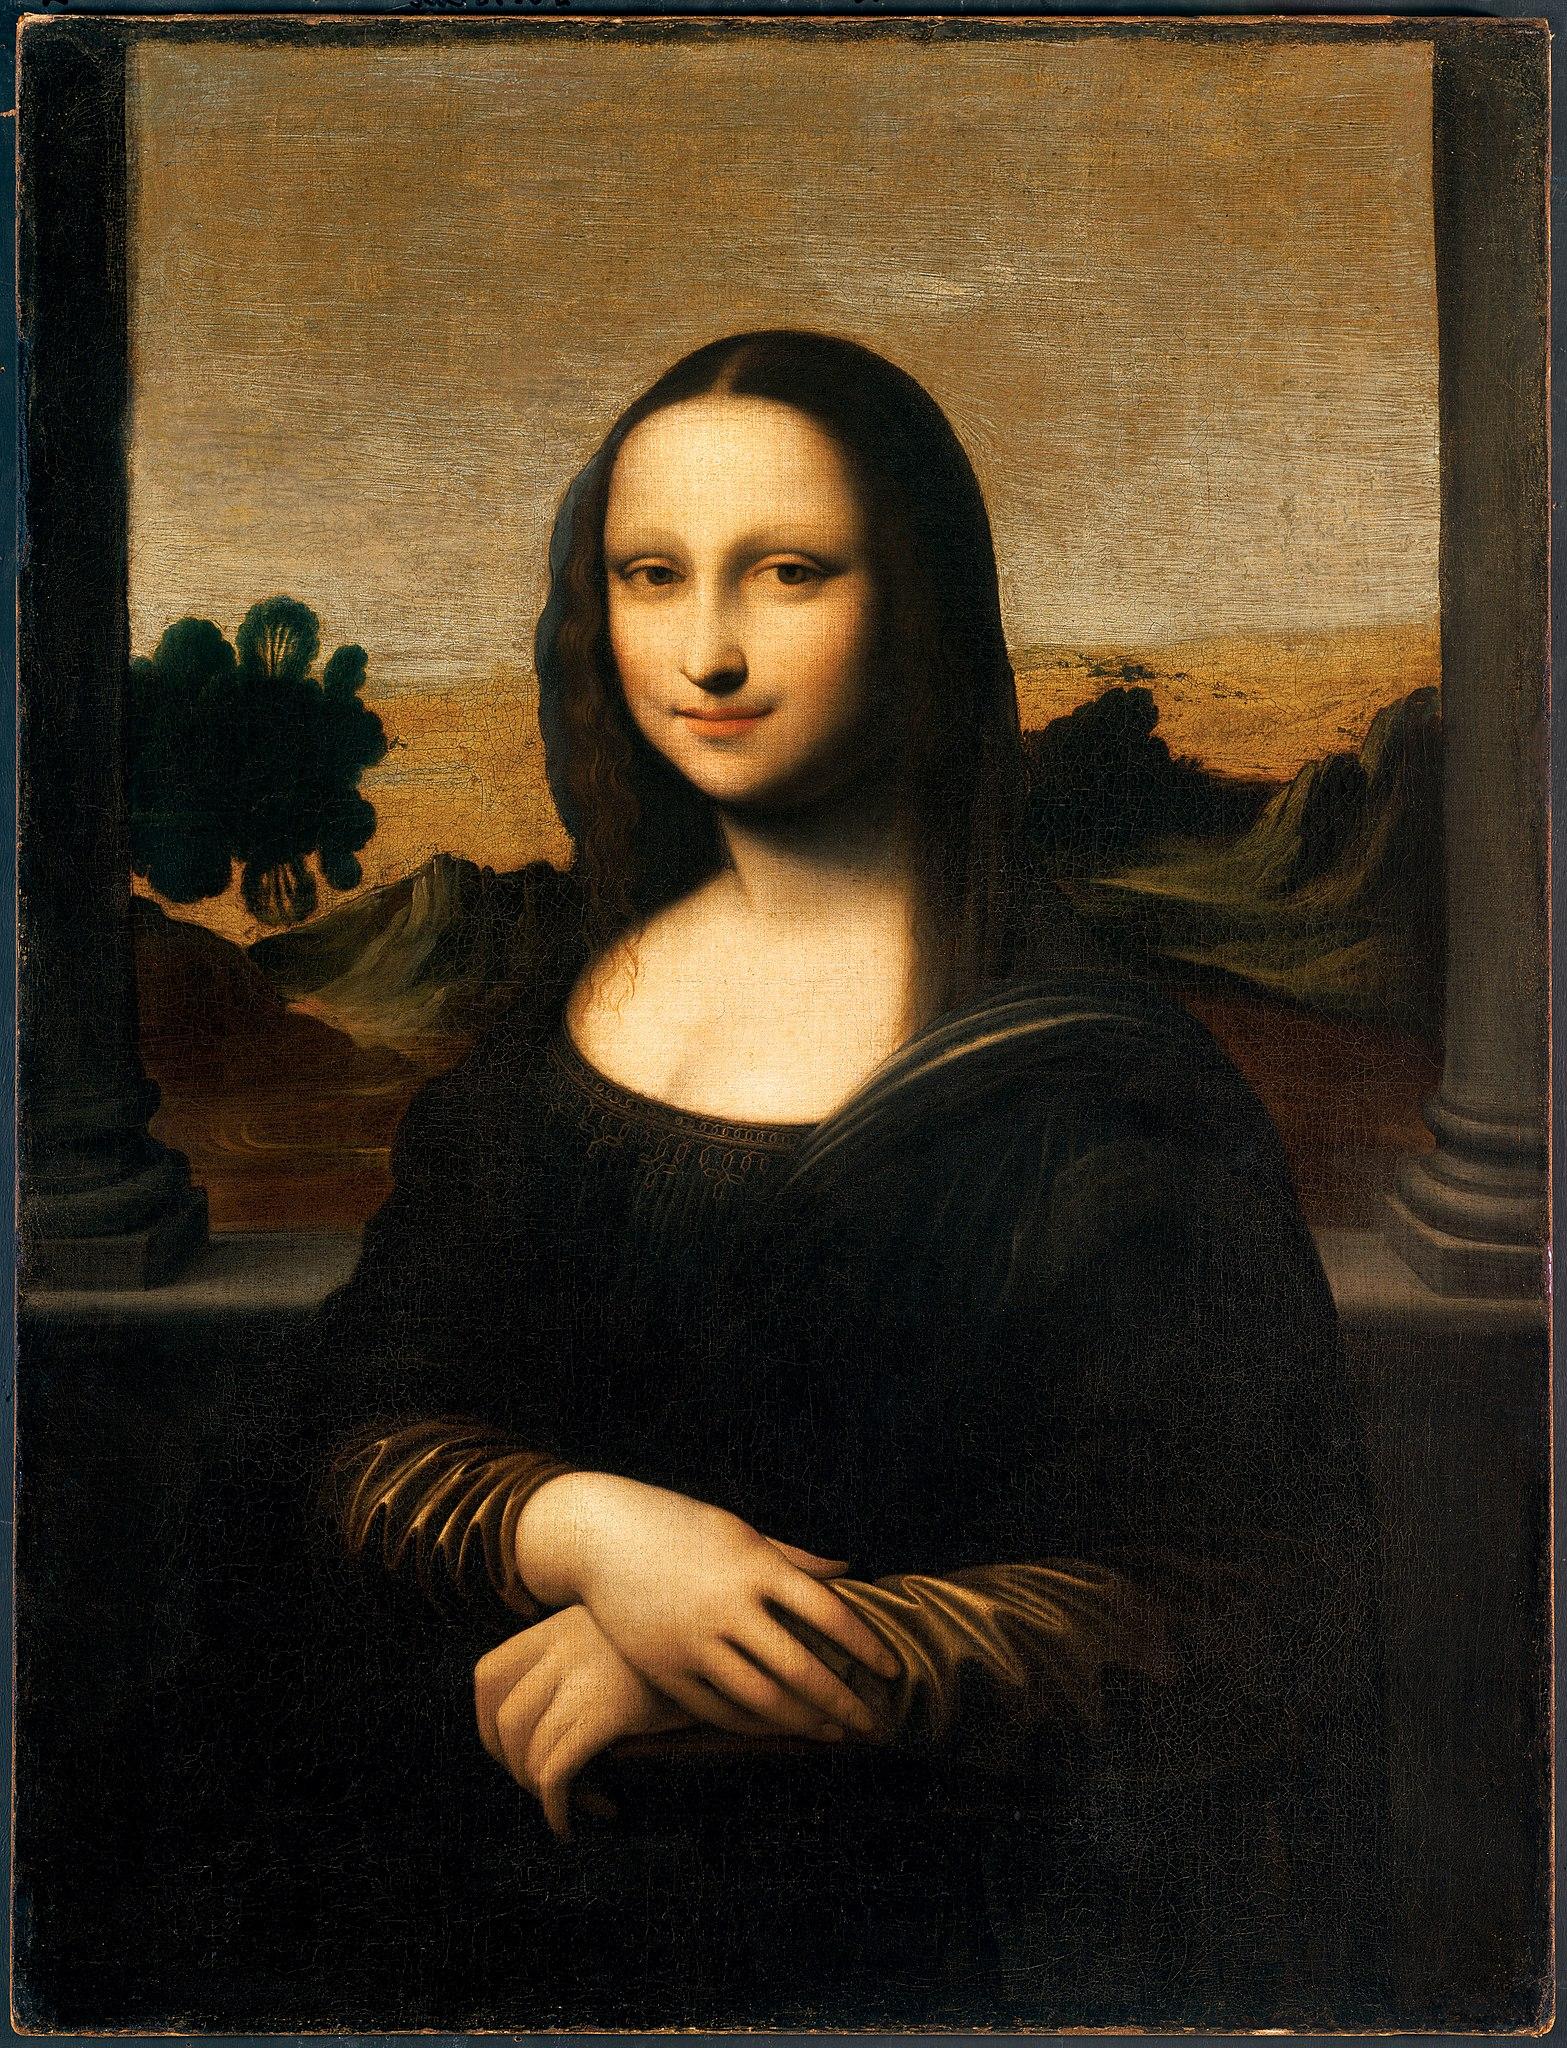 The Second Mona Lisa